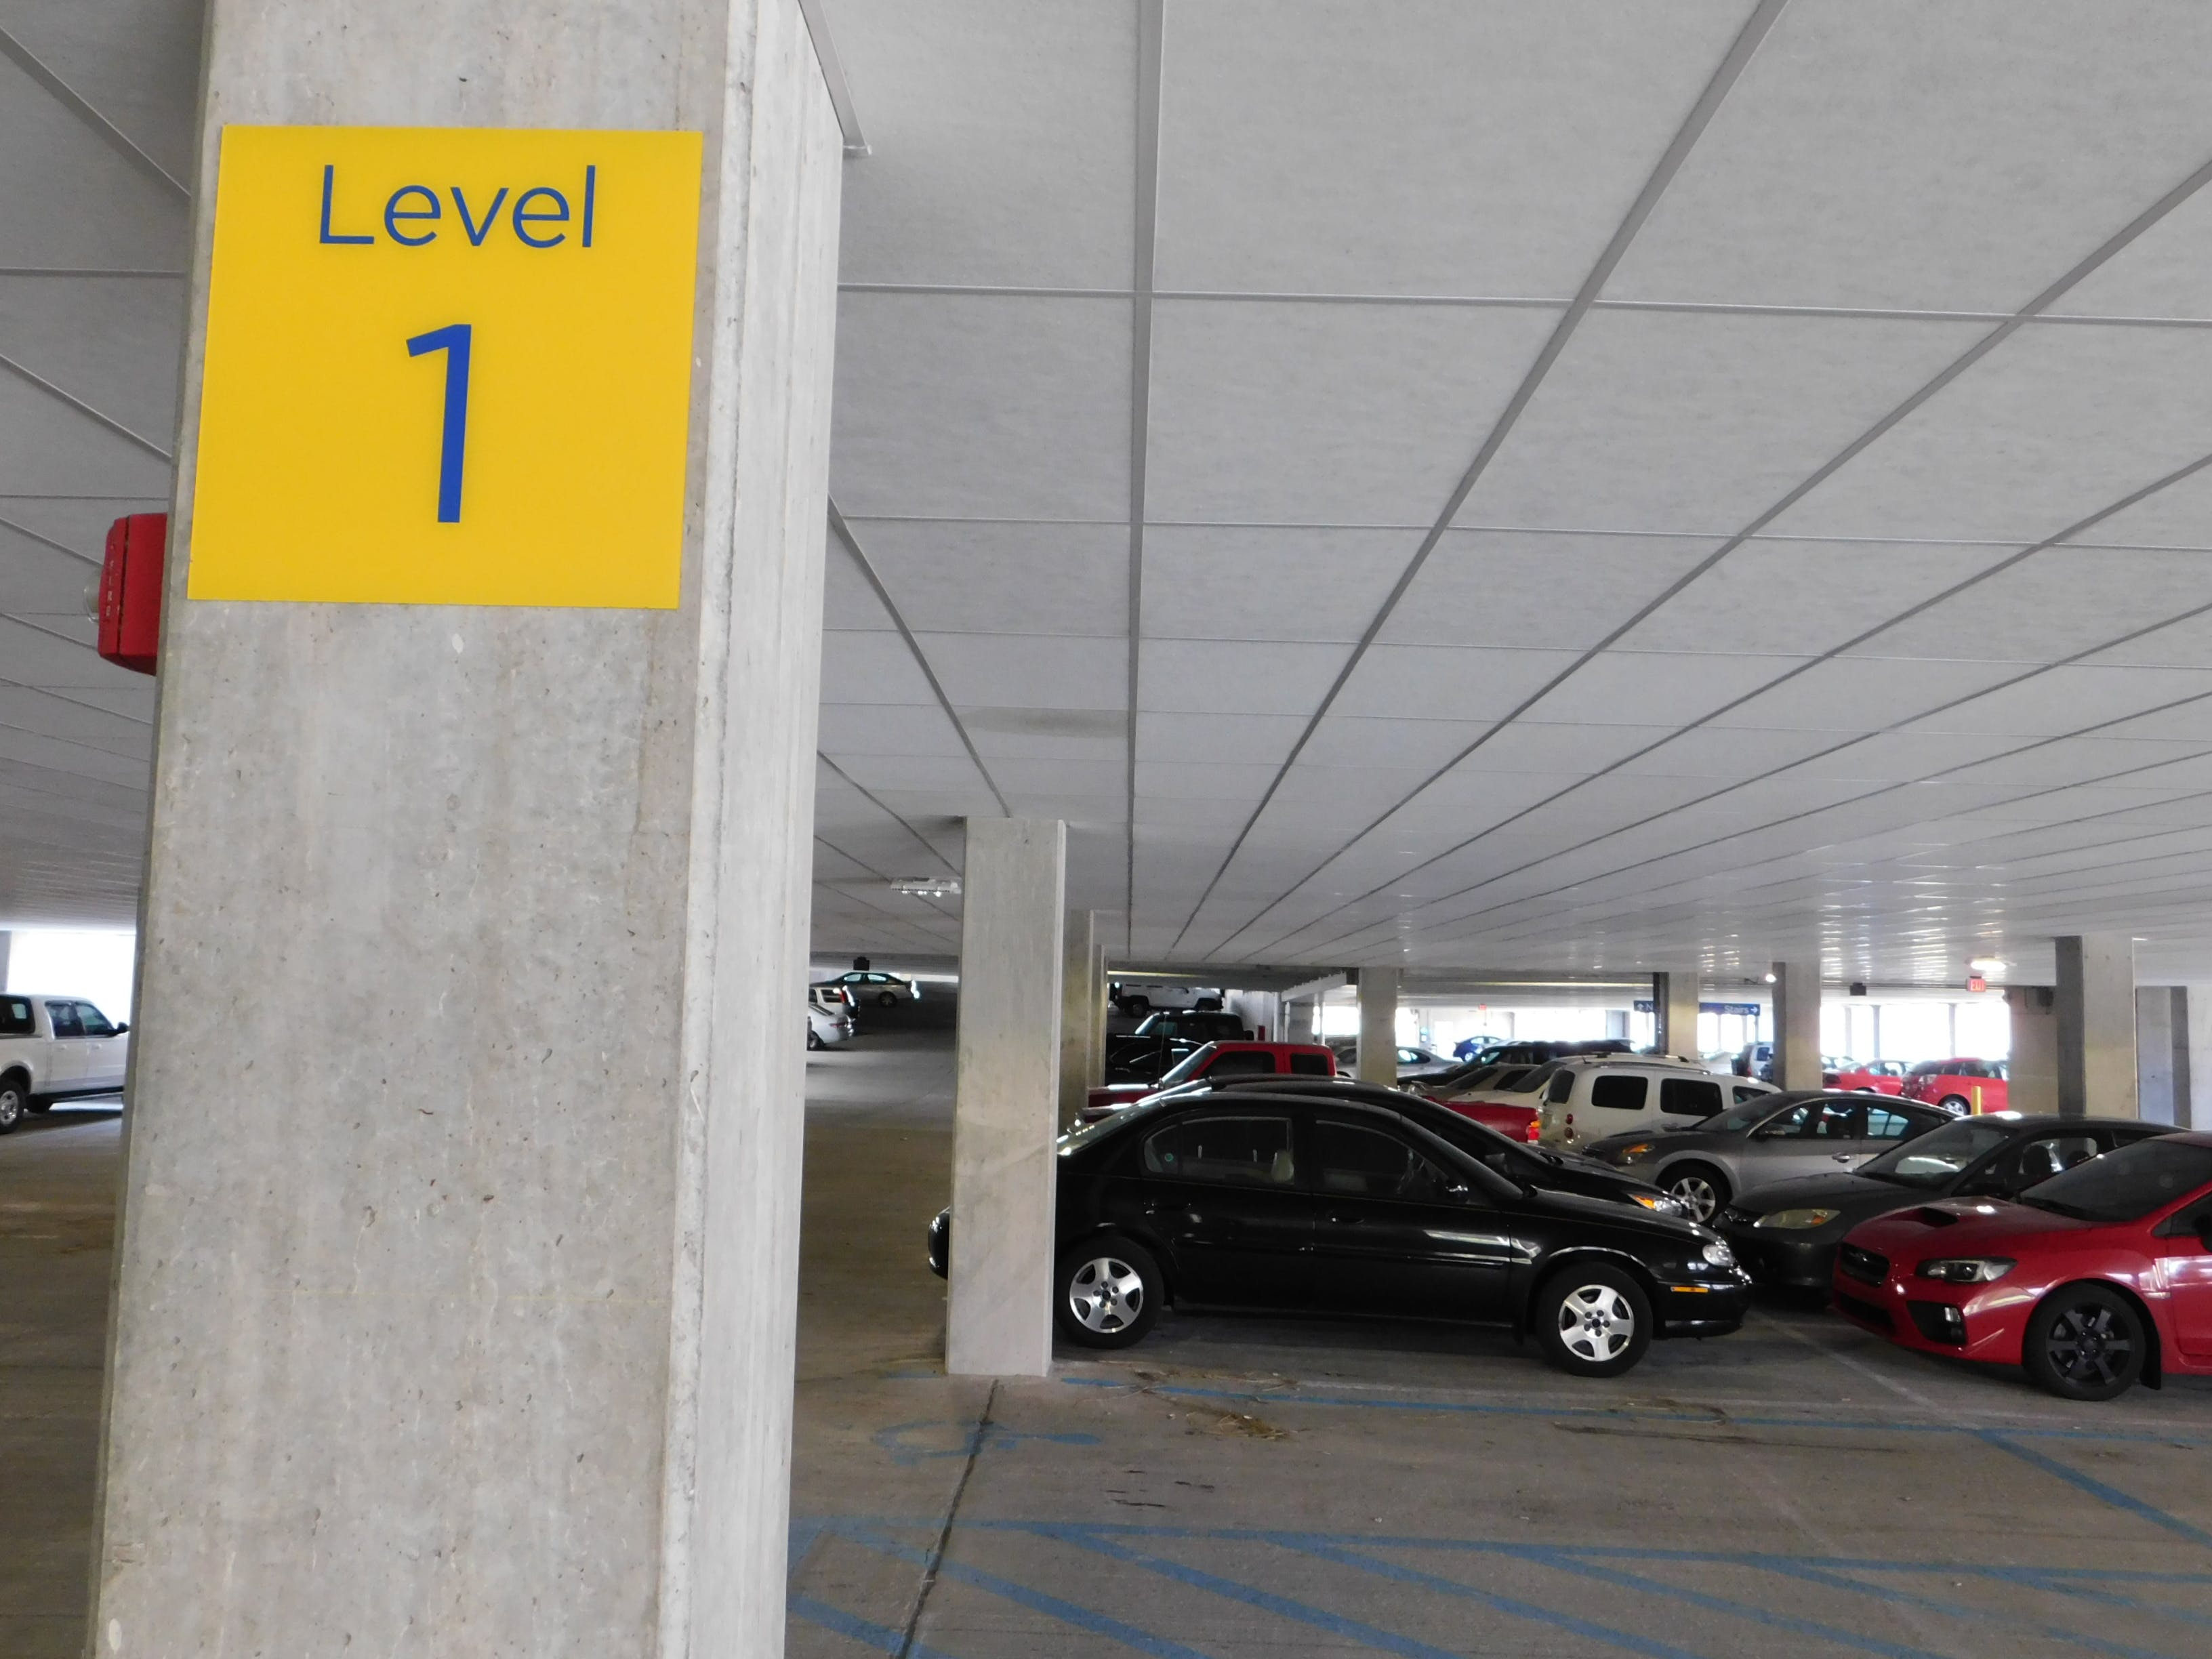 garage, parked cars, parking